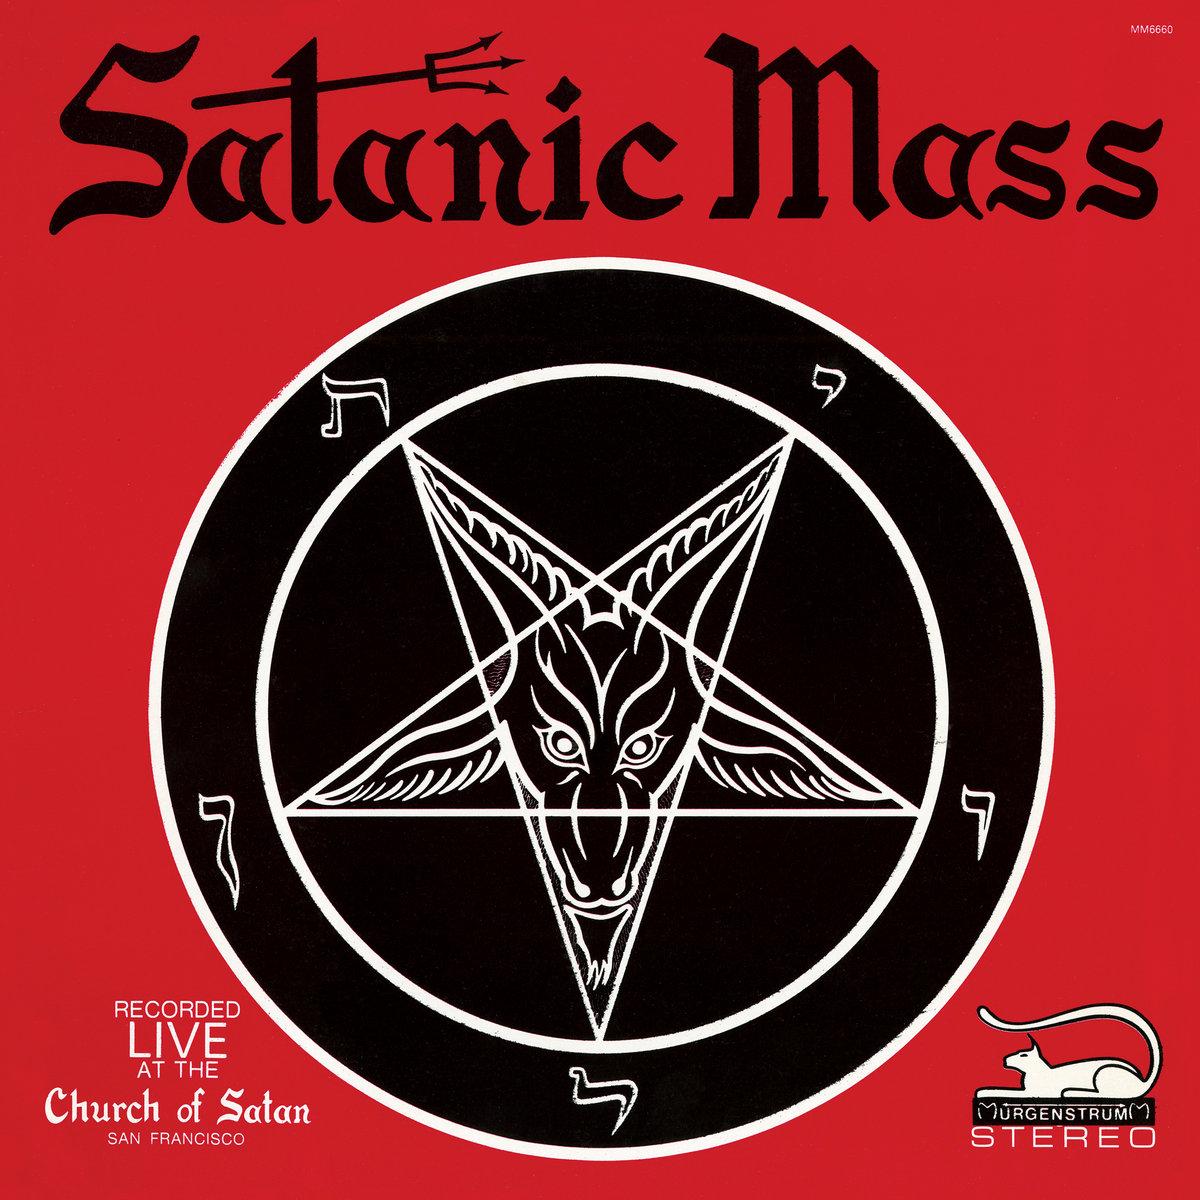 Satanic Mass - Recorded Live At The Church of Satan   Anton Lavey